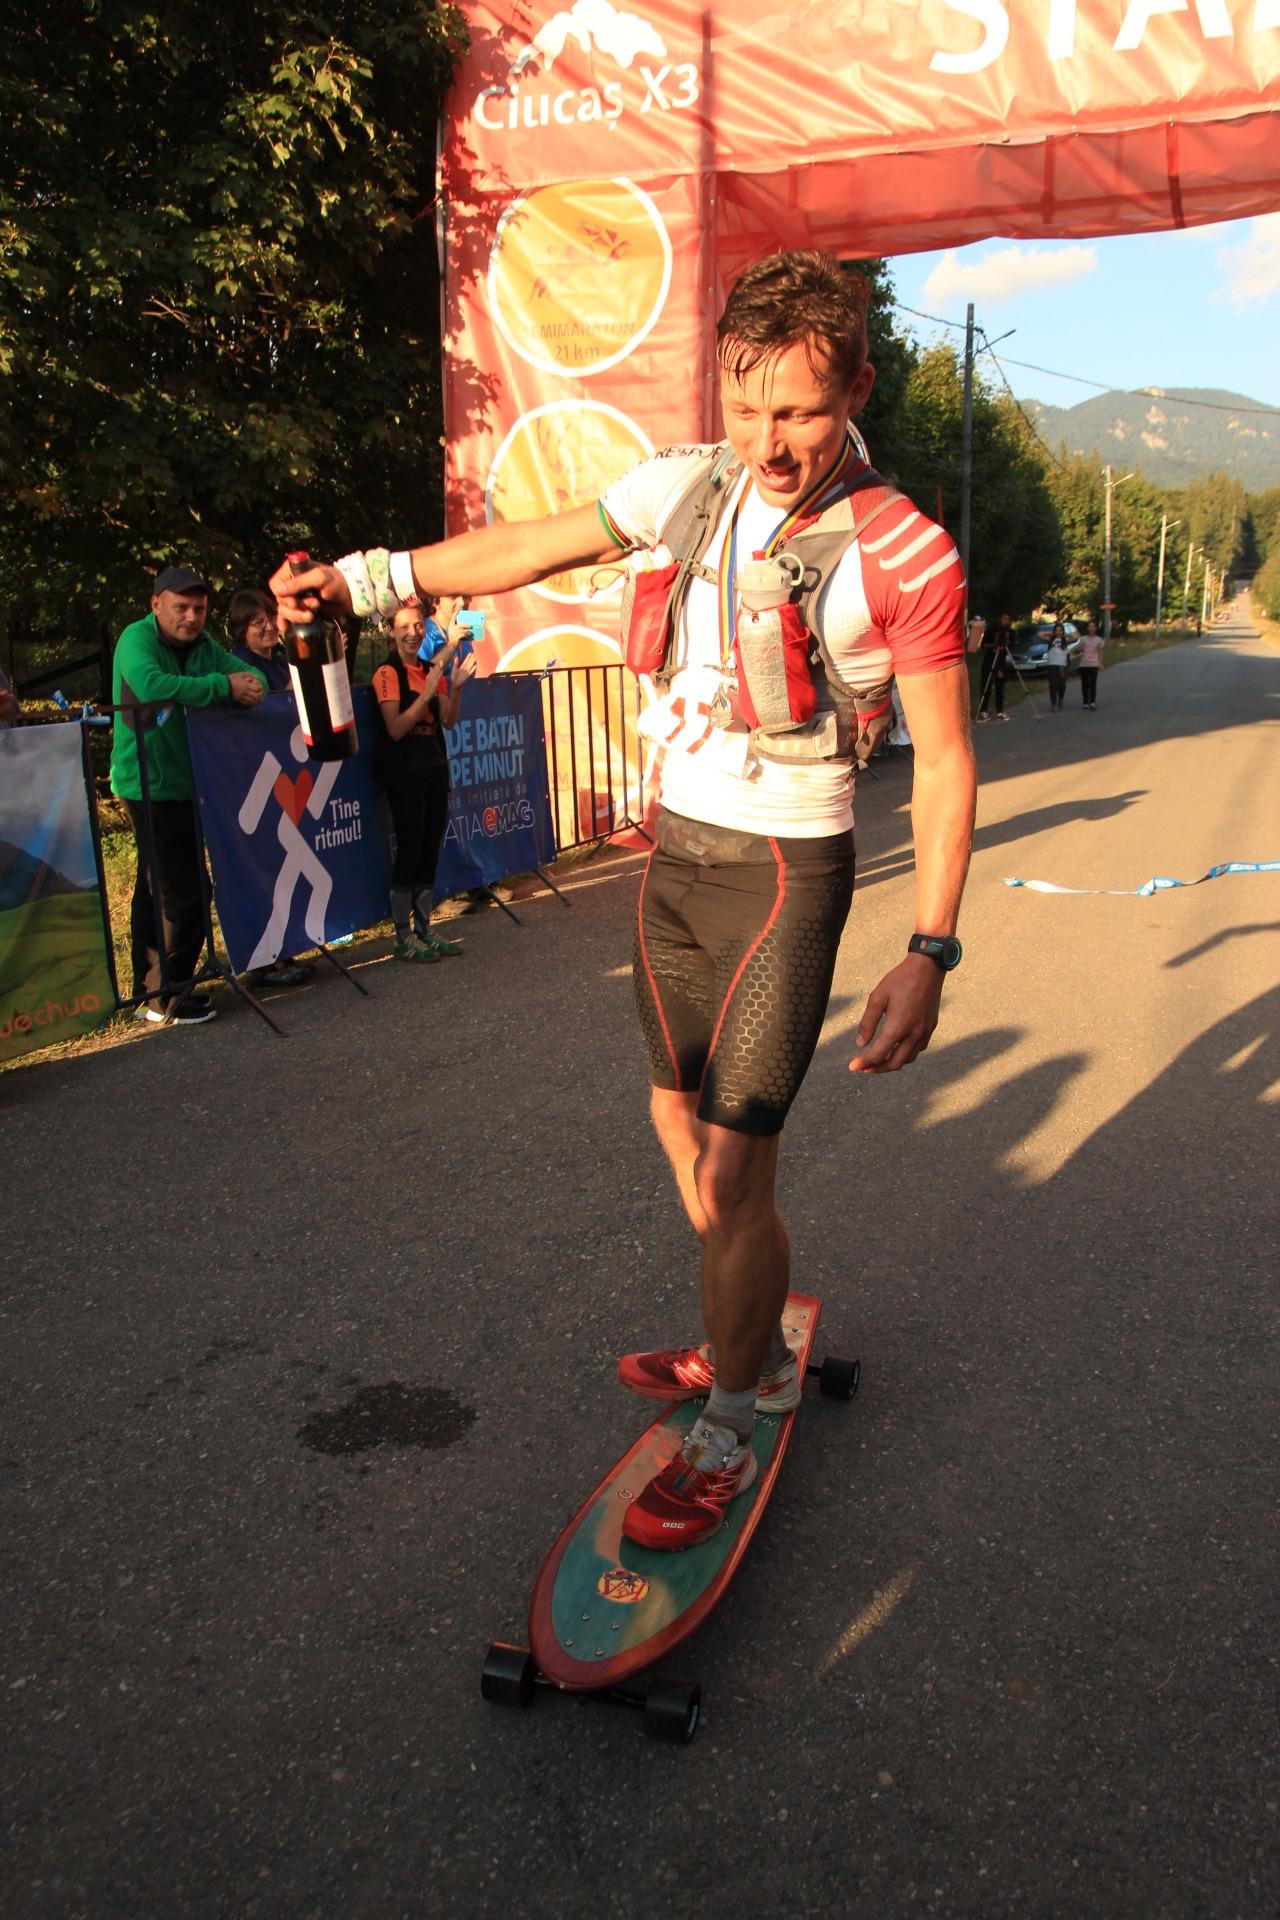 Finish UltramaratonCiucasX3